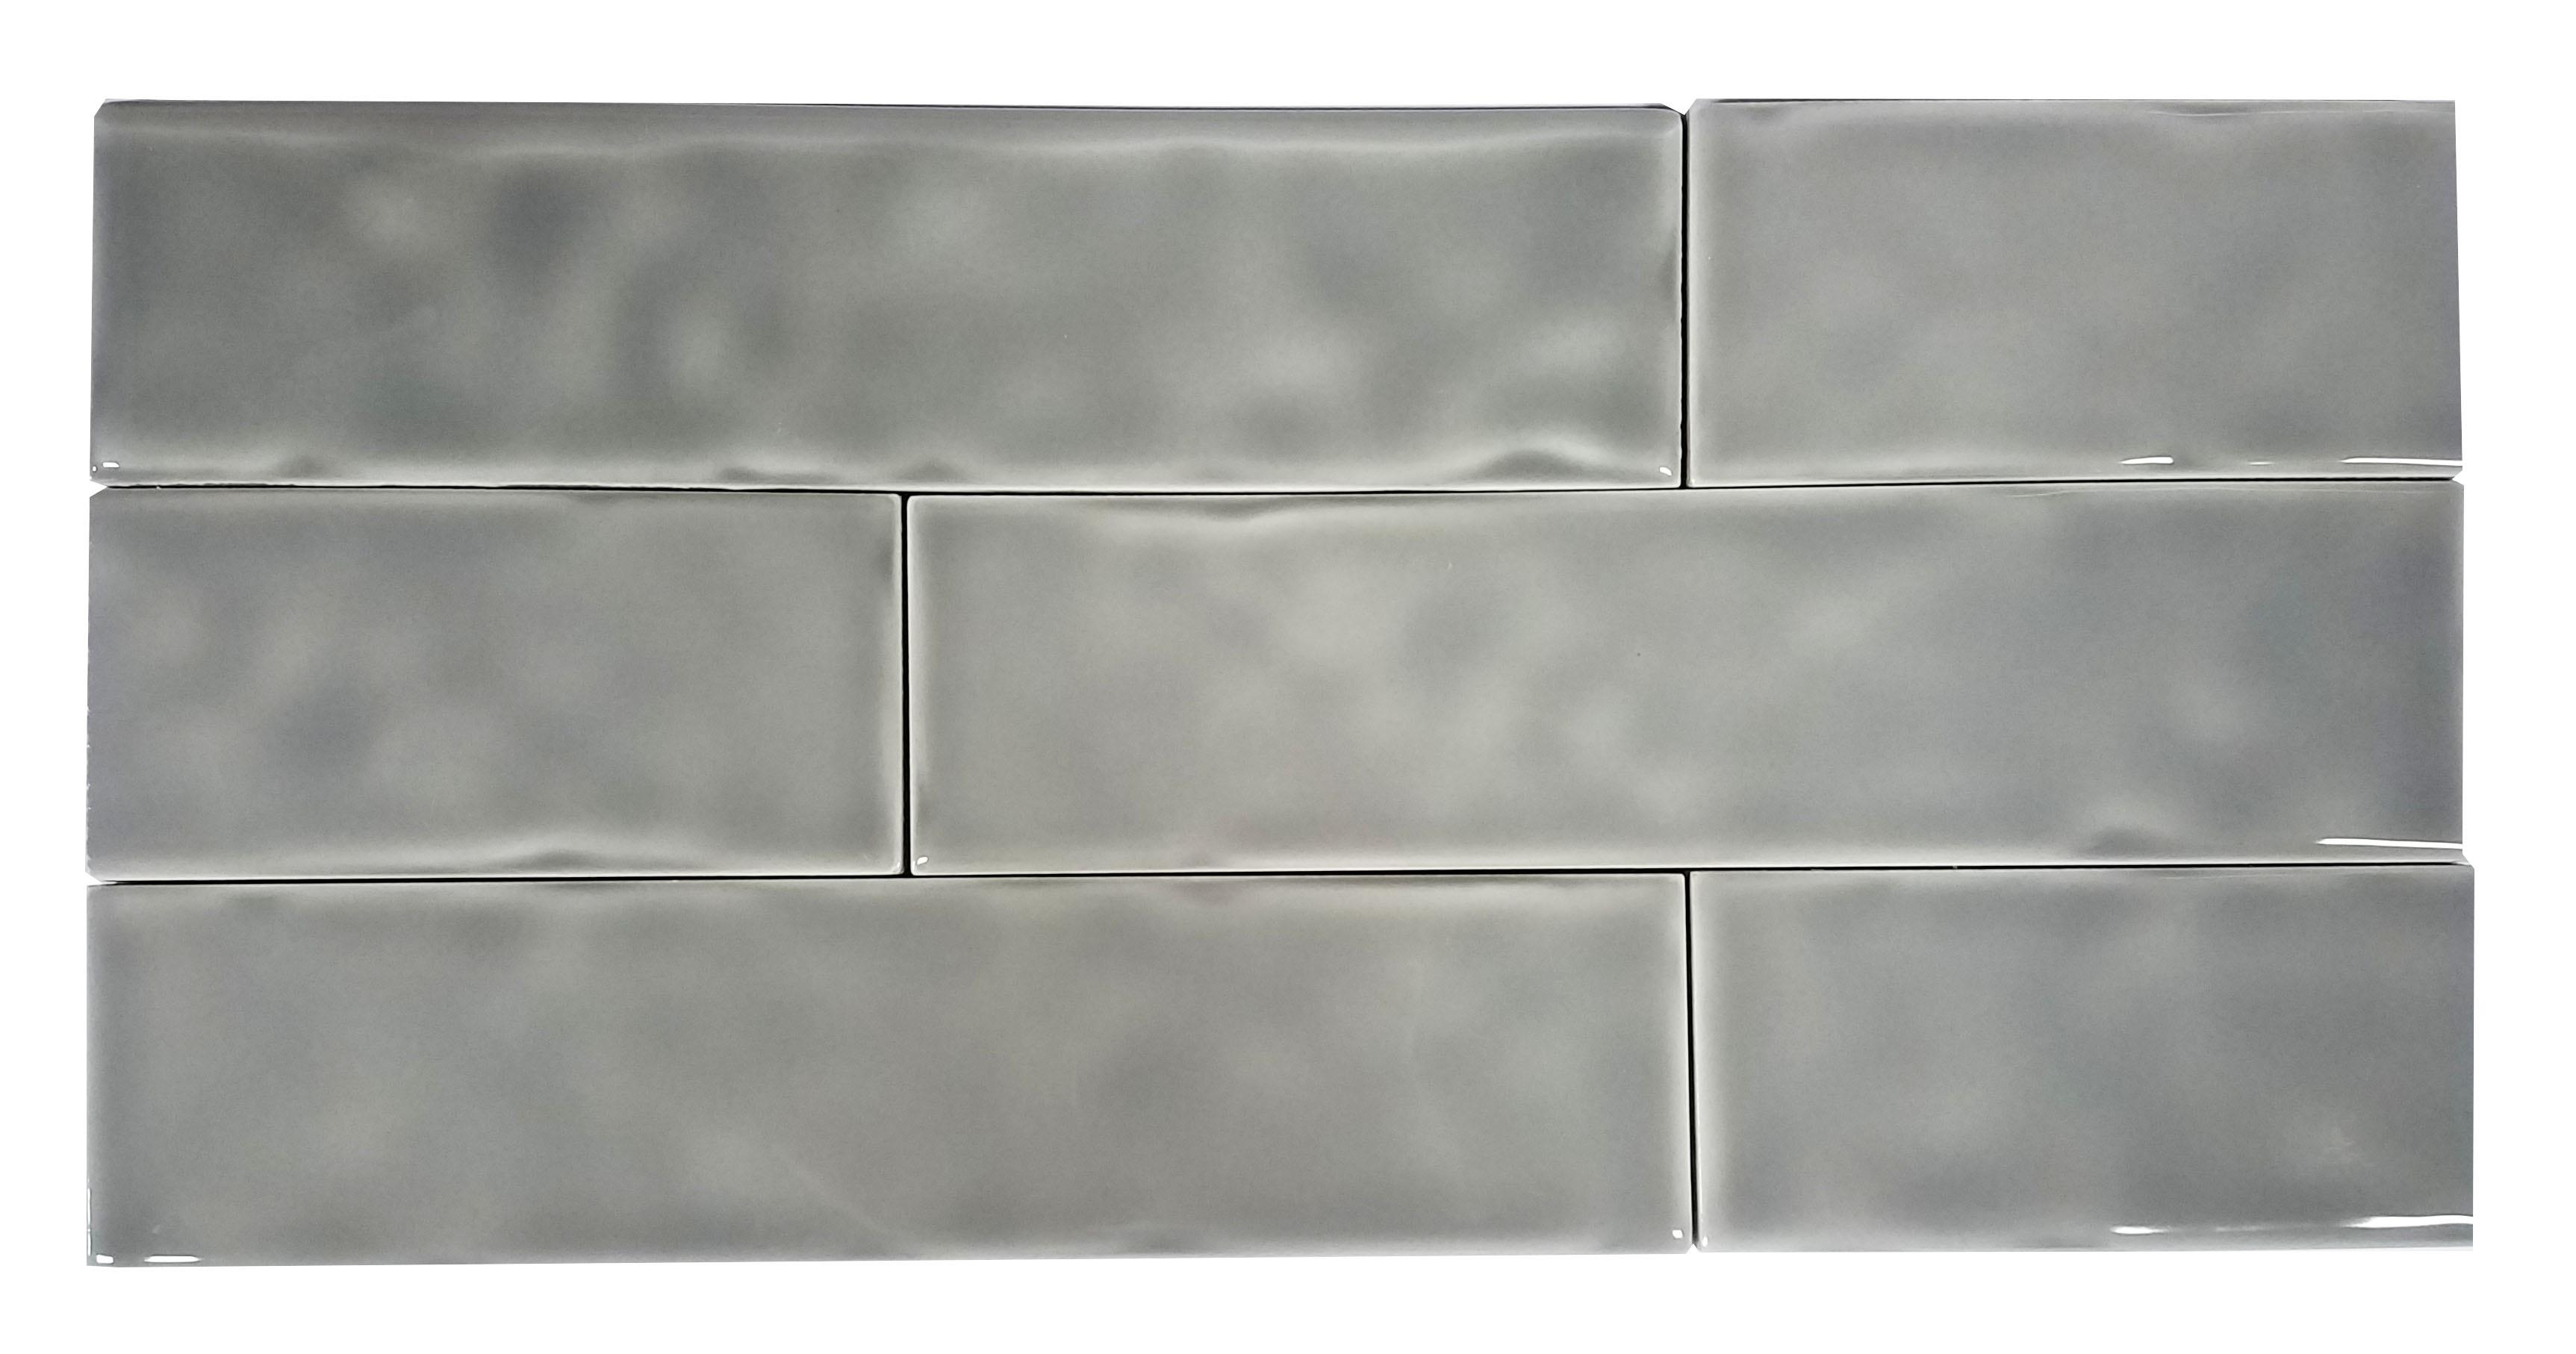 2 x 8 Chelsea Lavagna Ceramic Wall subway